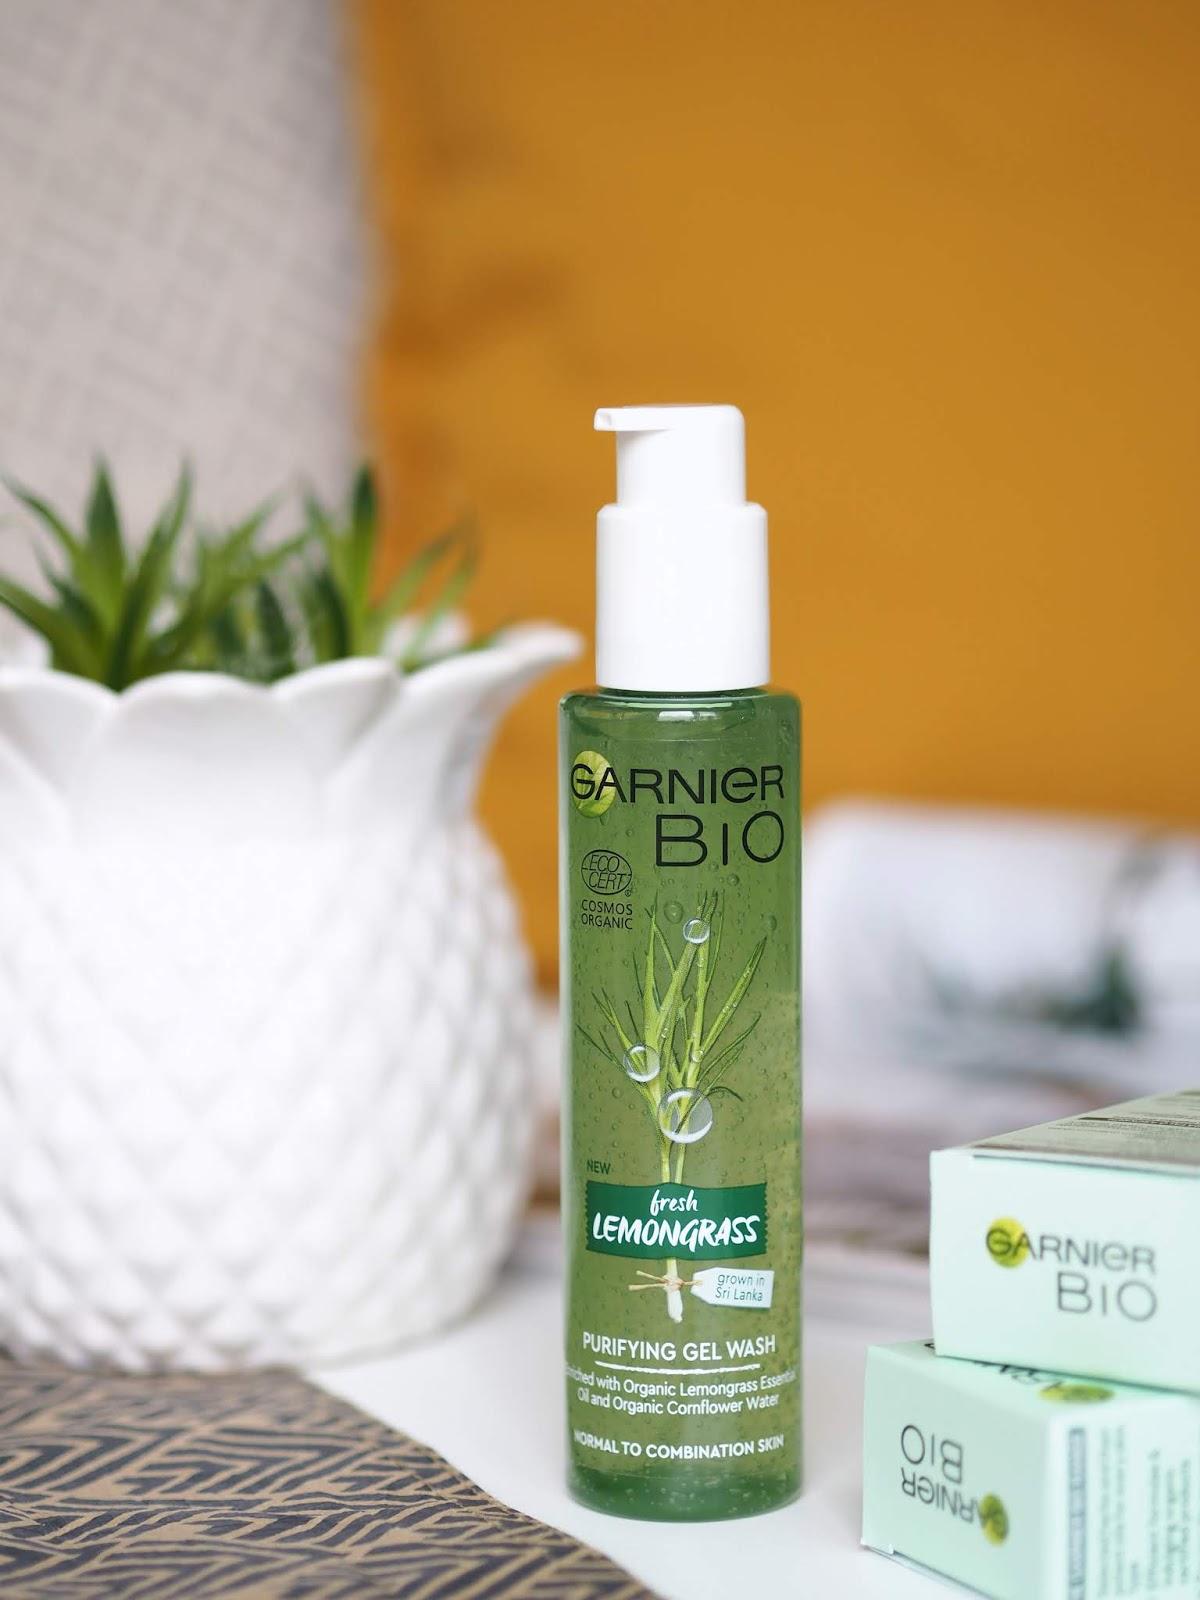 Garnier Bio Fresh Lemongrass Purifying Gel Wash čistiaci gél normálna zmiešaná pokožka